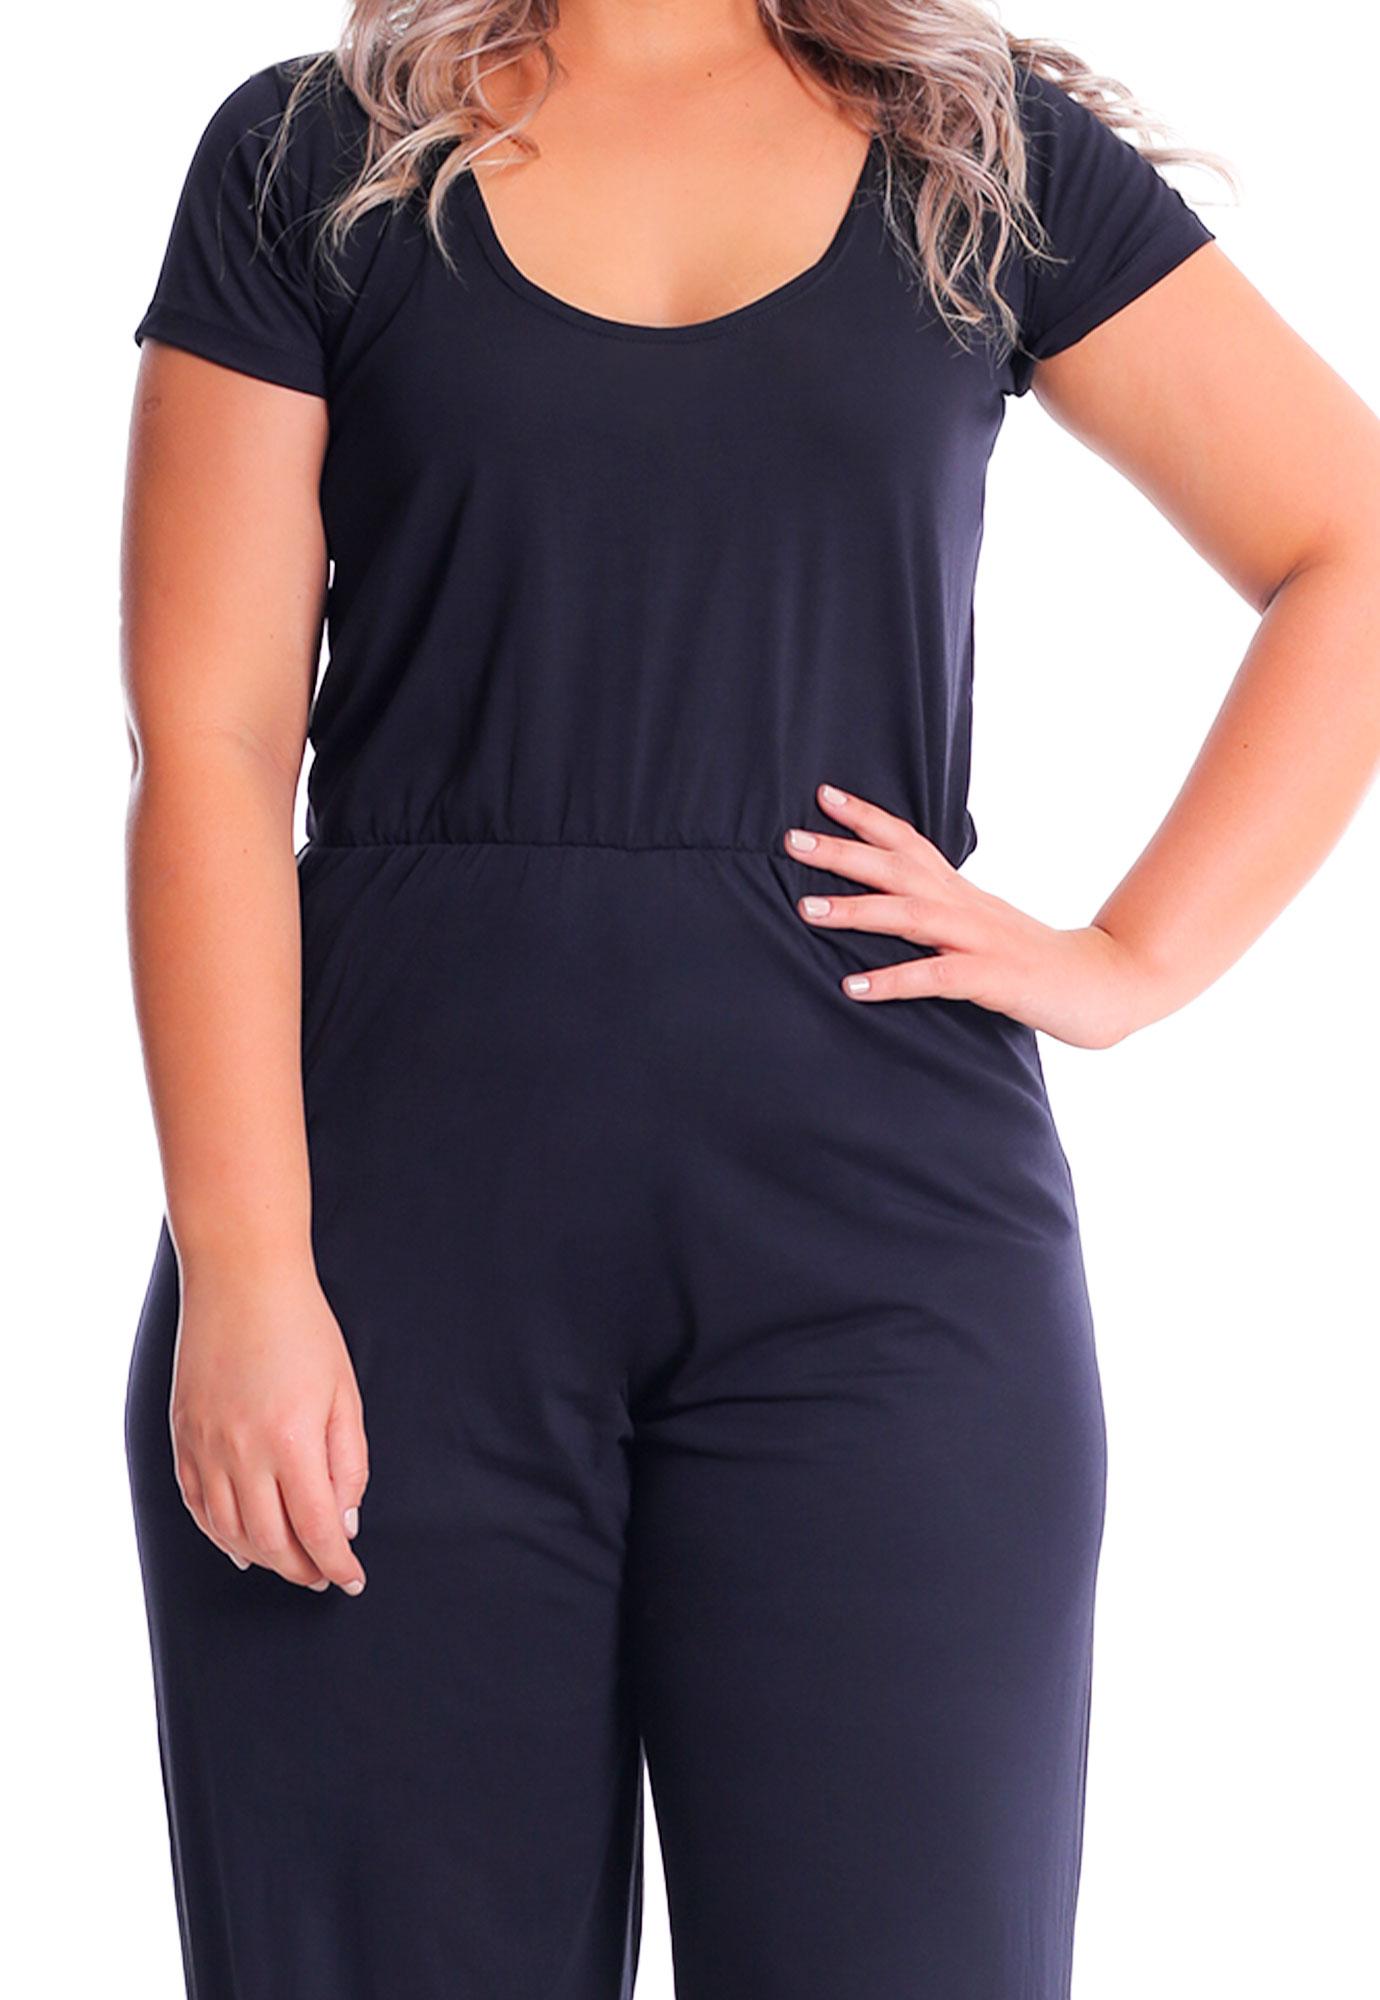 Macacão Longo T-shirt Plus Size Lynnce